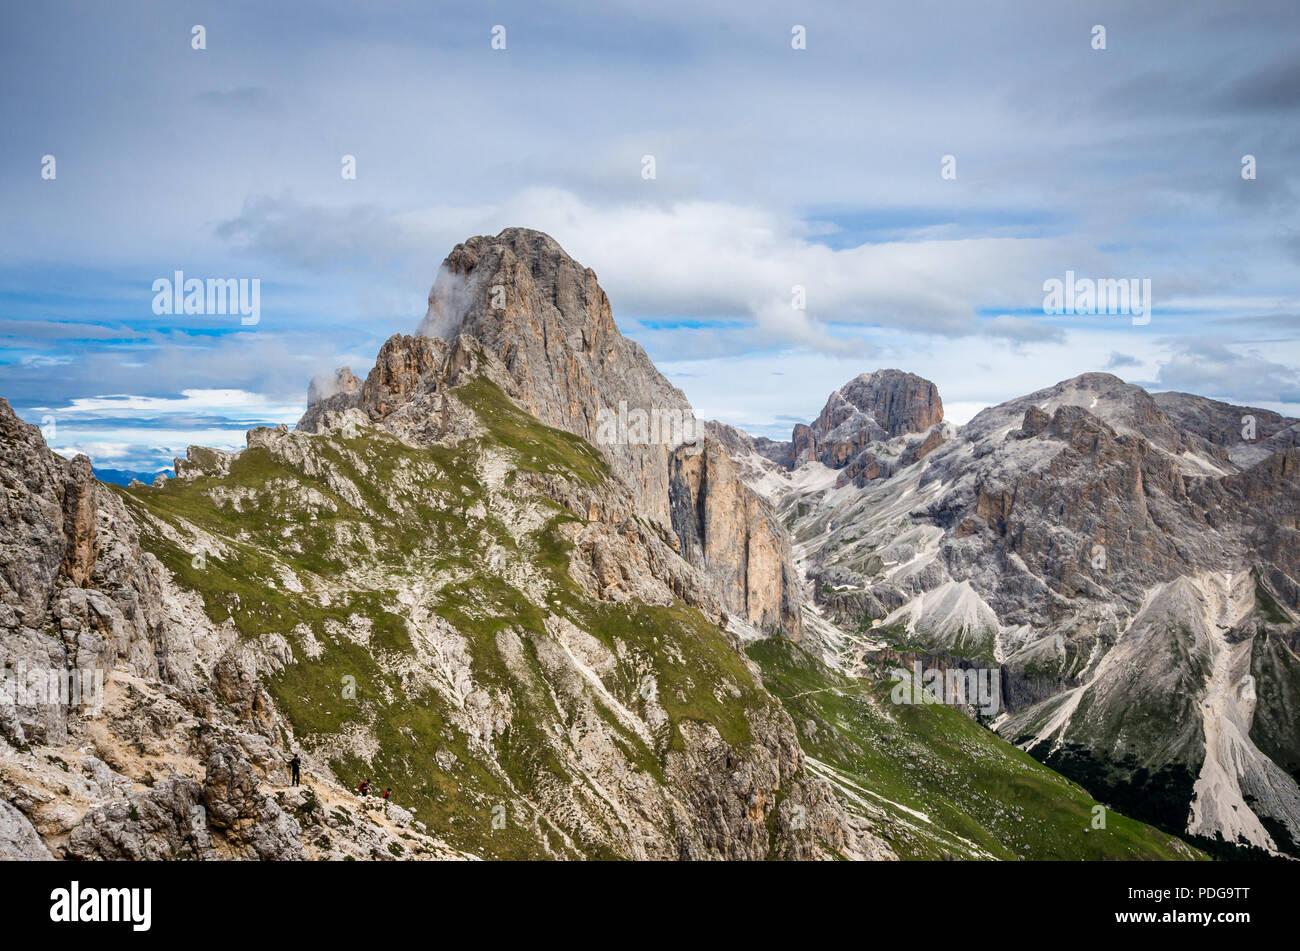 Rosengarten Catinaccio massif, Dolomites, Italy. Spectacular view in Val di Vajolet, Dolomiti mountains, Alto Adige, South Tyrol - Stock Image